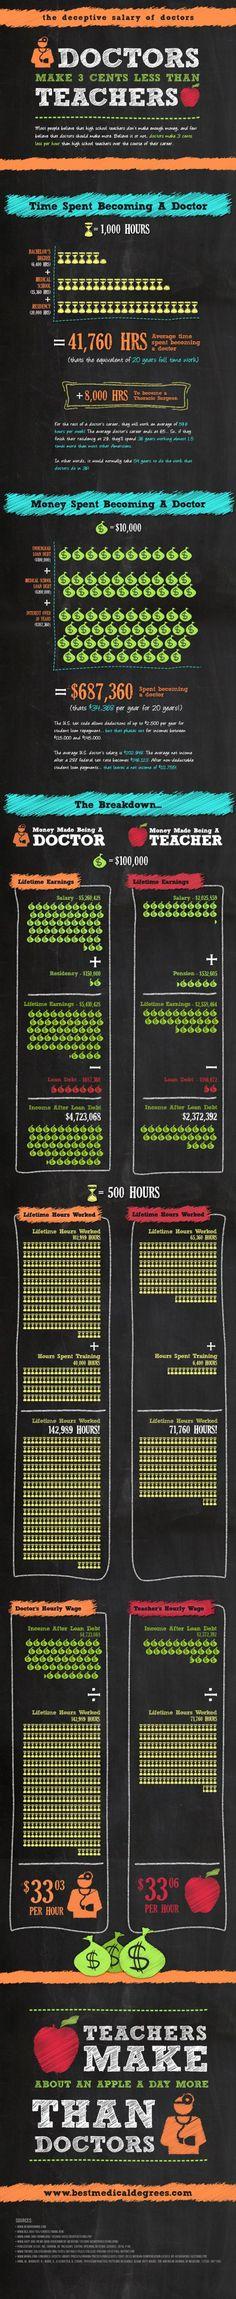 Salary of Doctors